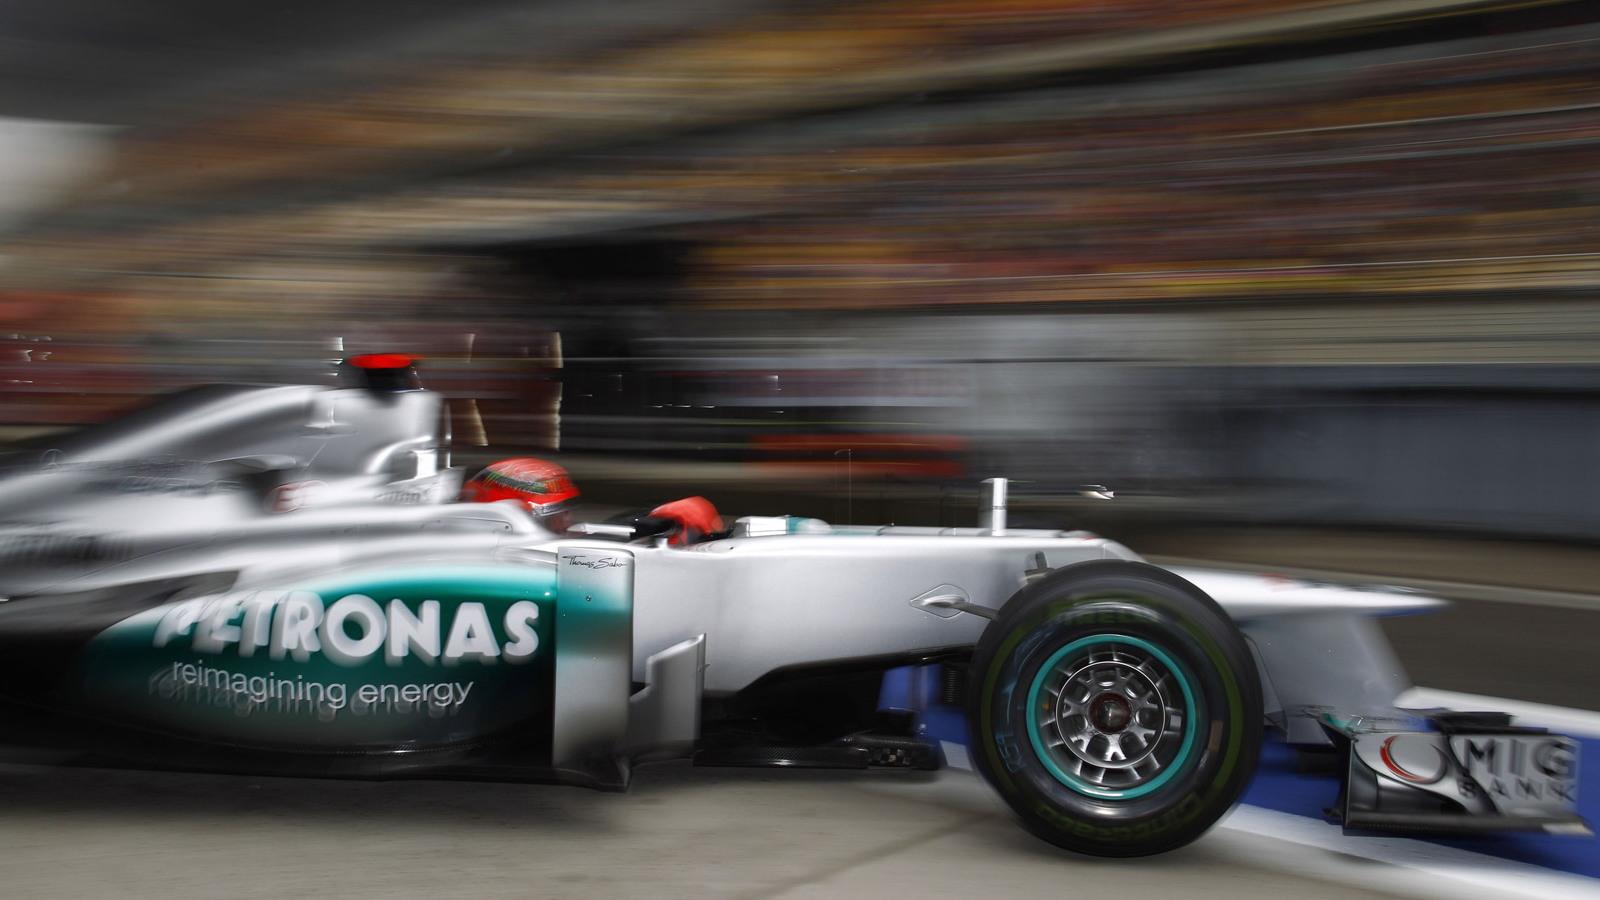 Michael Schumacher in his 2012 Mercedes AMG Formula 1 car